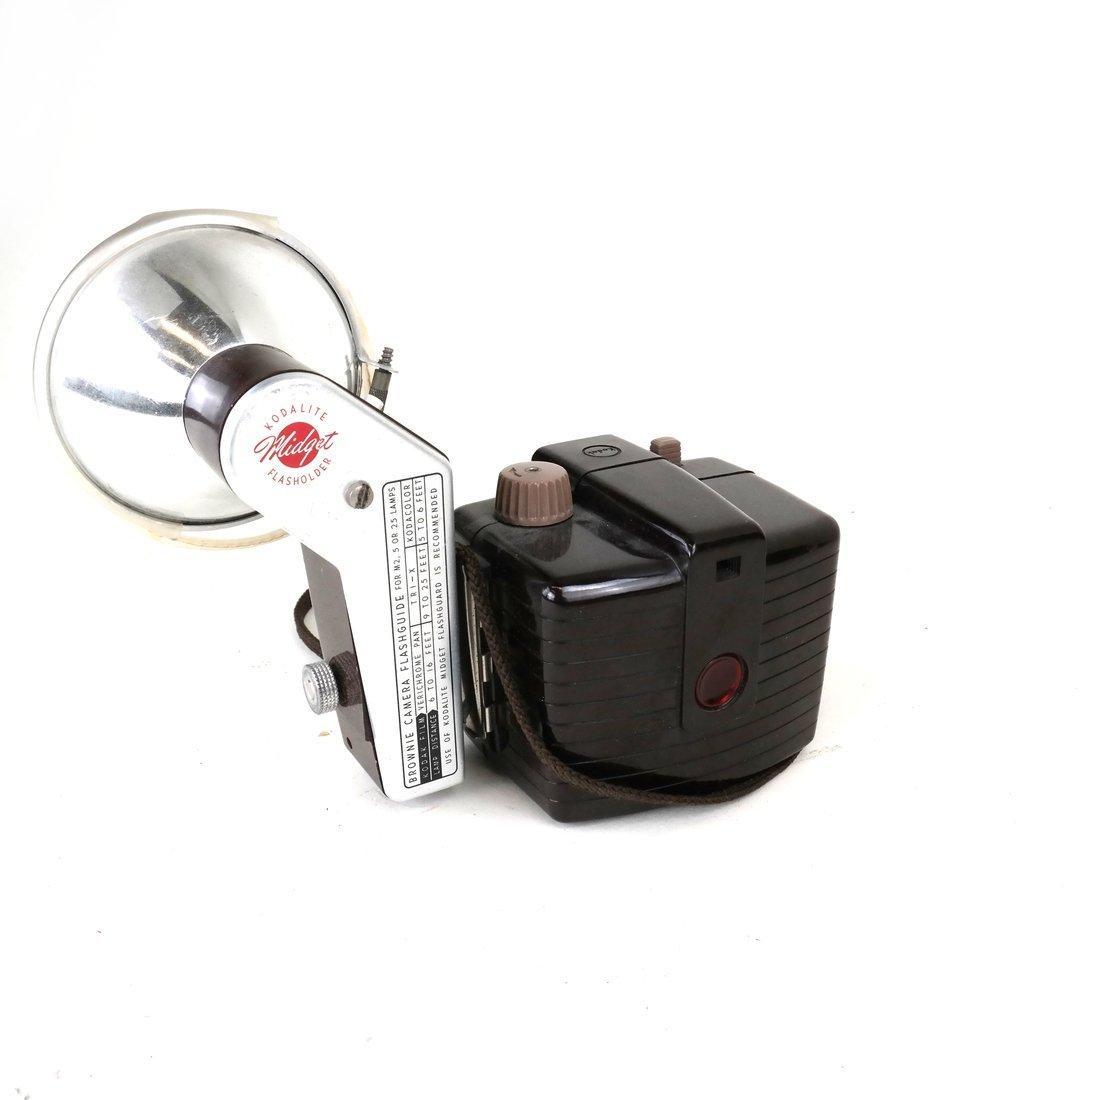 Assorted Kodak Cameras - 8